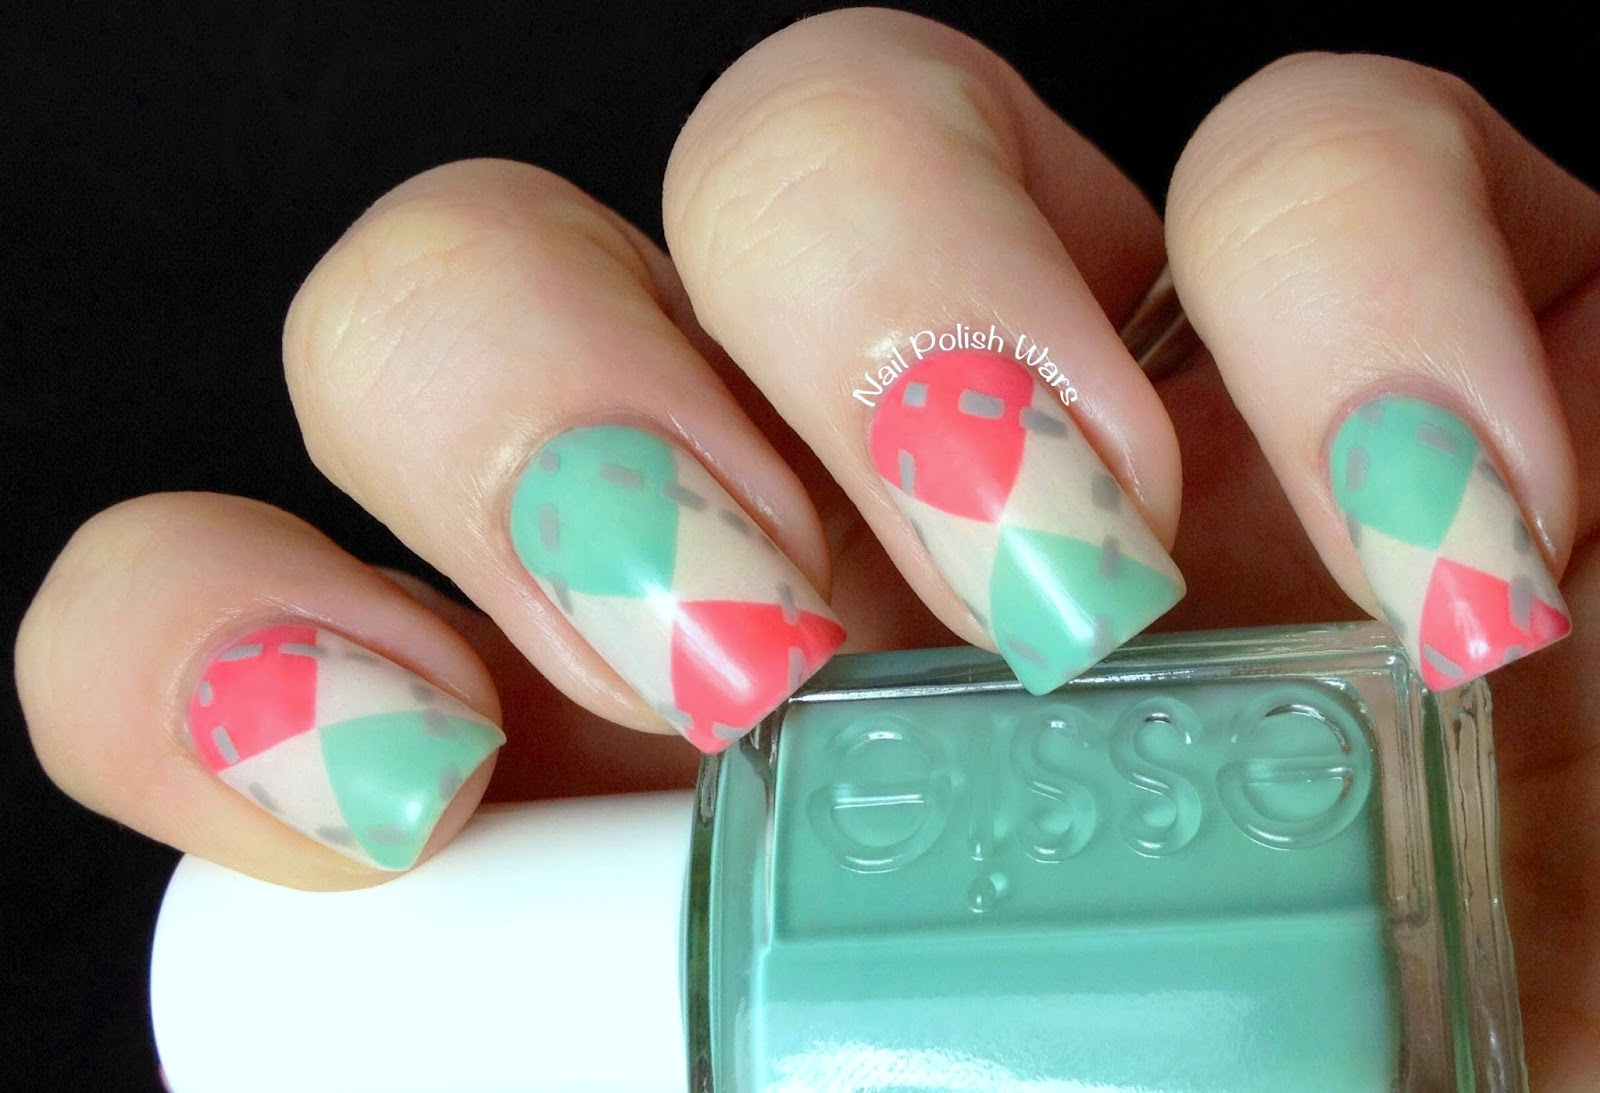 Magnificent Wax Nail Polish Adornment - Nail Art Design Ideas ...